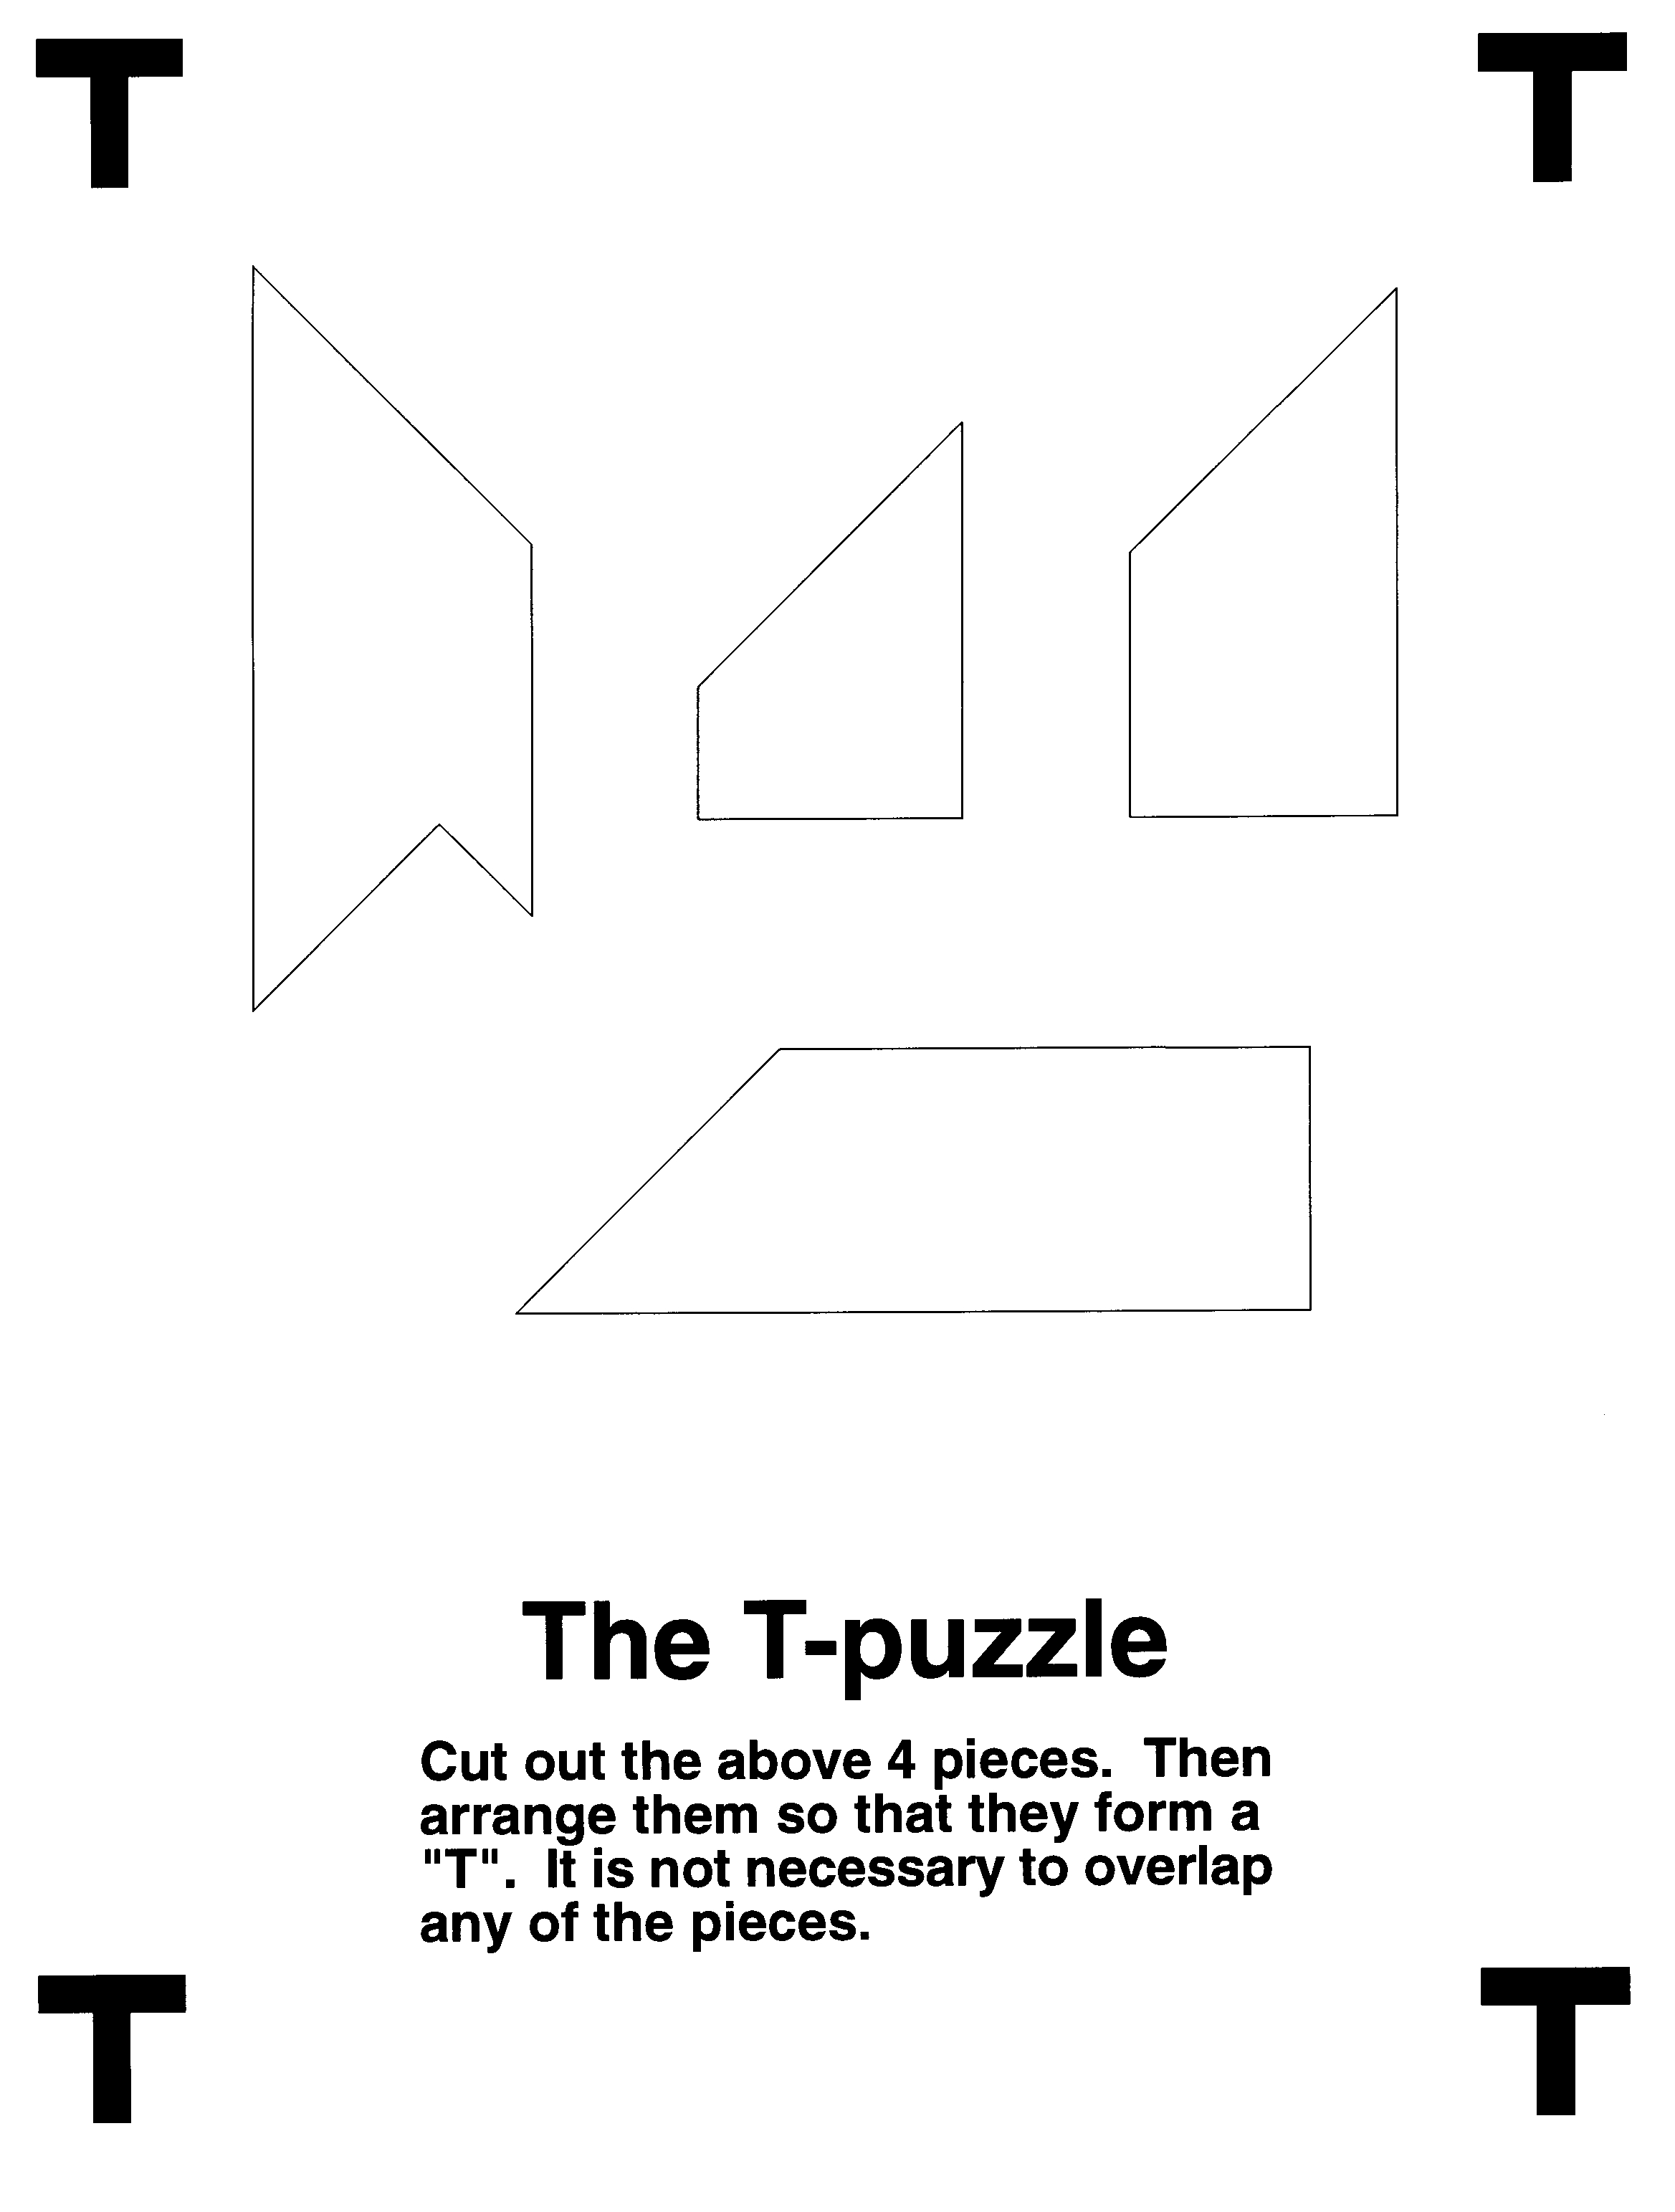 Diy Puzzles | Puzzles.ca - Letter T Puzzle Printable